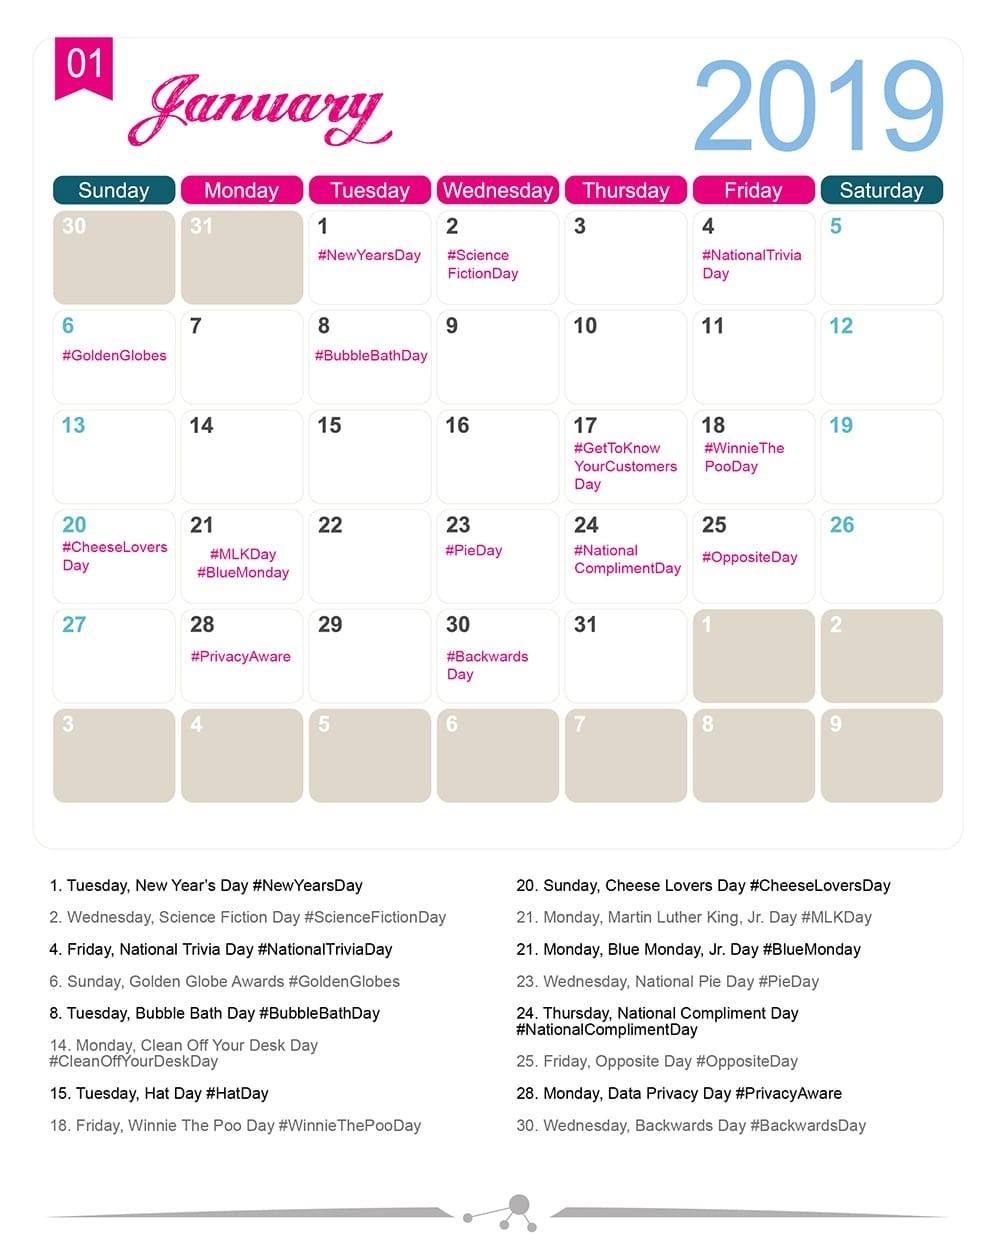 The 2019 Social Media Holiday Calendar - Make A Website Hub-August 2020 Food Holidays Usa